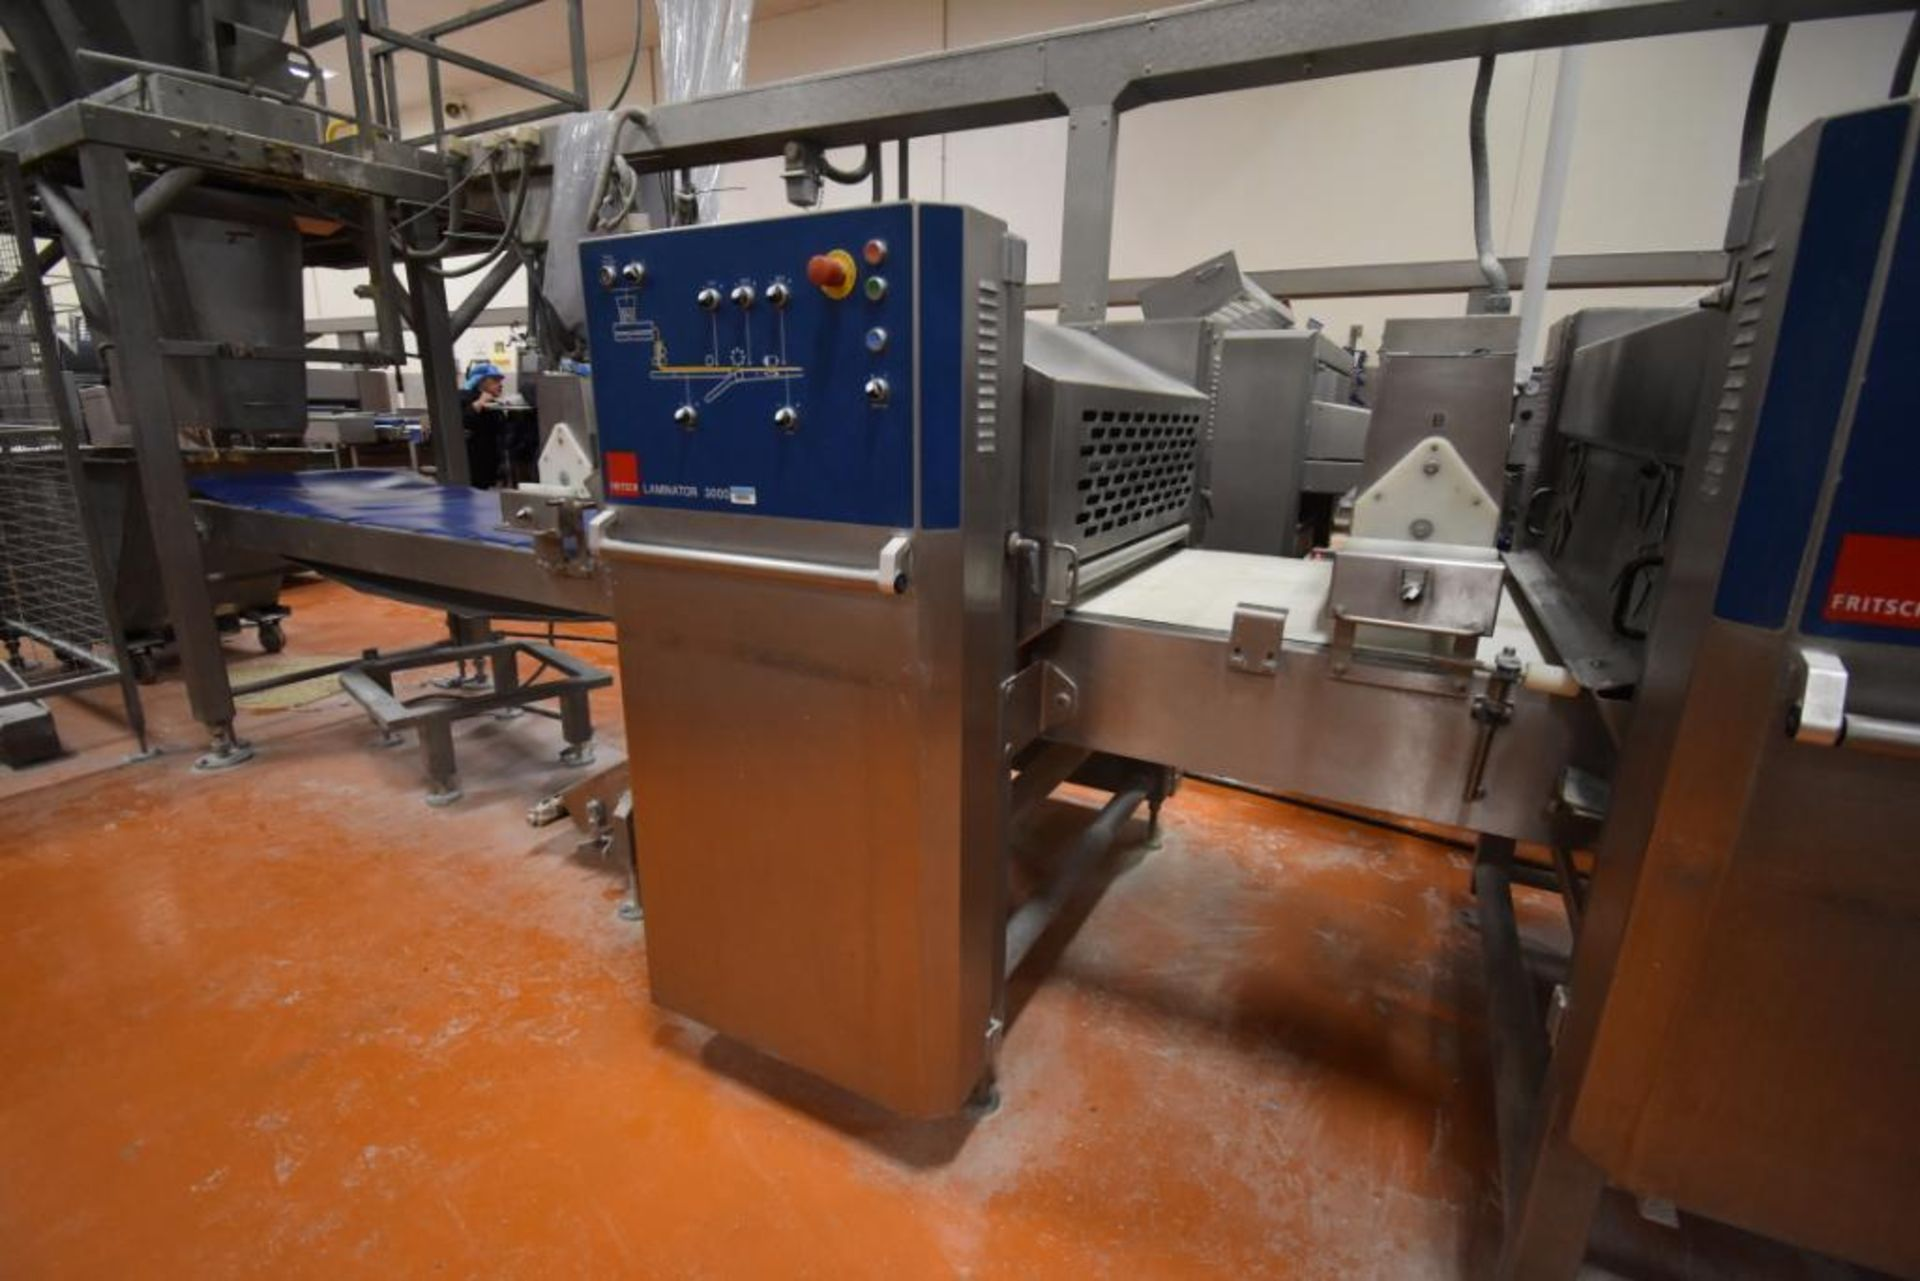 2007 Fritsch Laminator 3000 dough line - Image 64 of 280